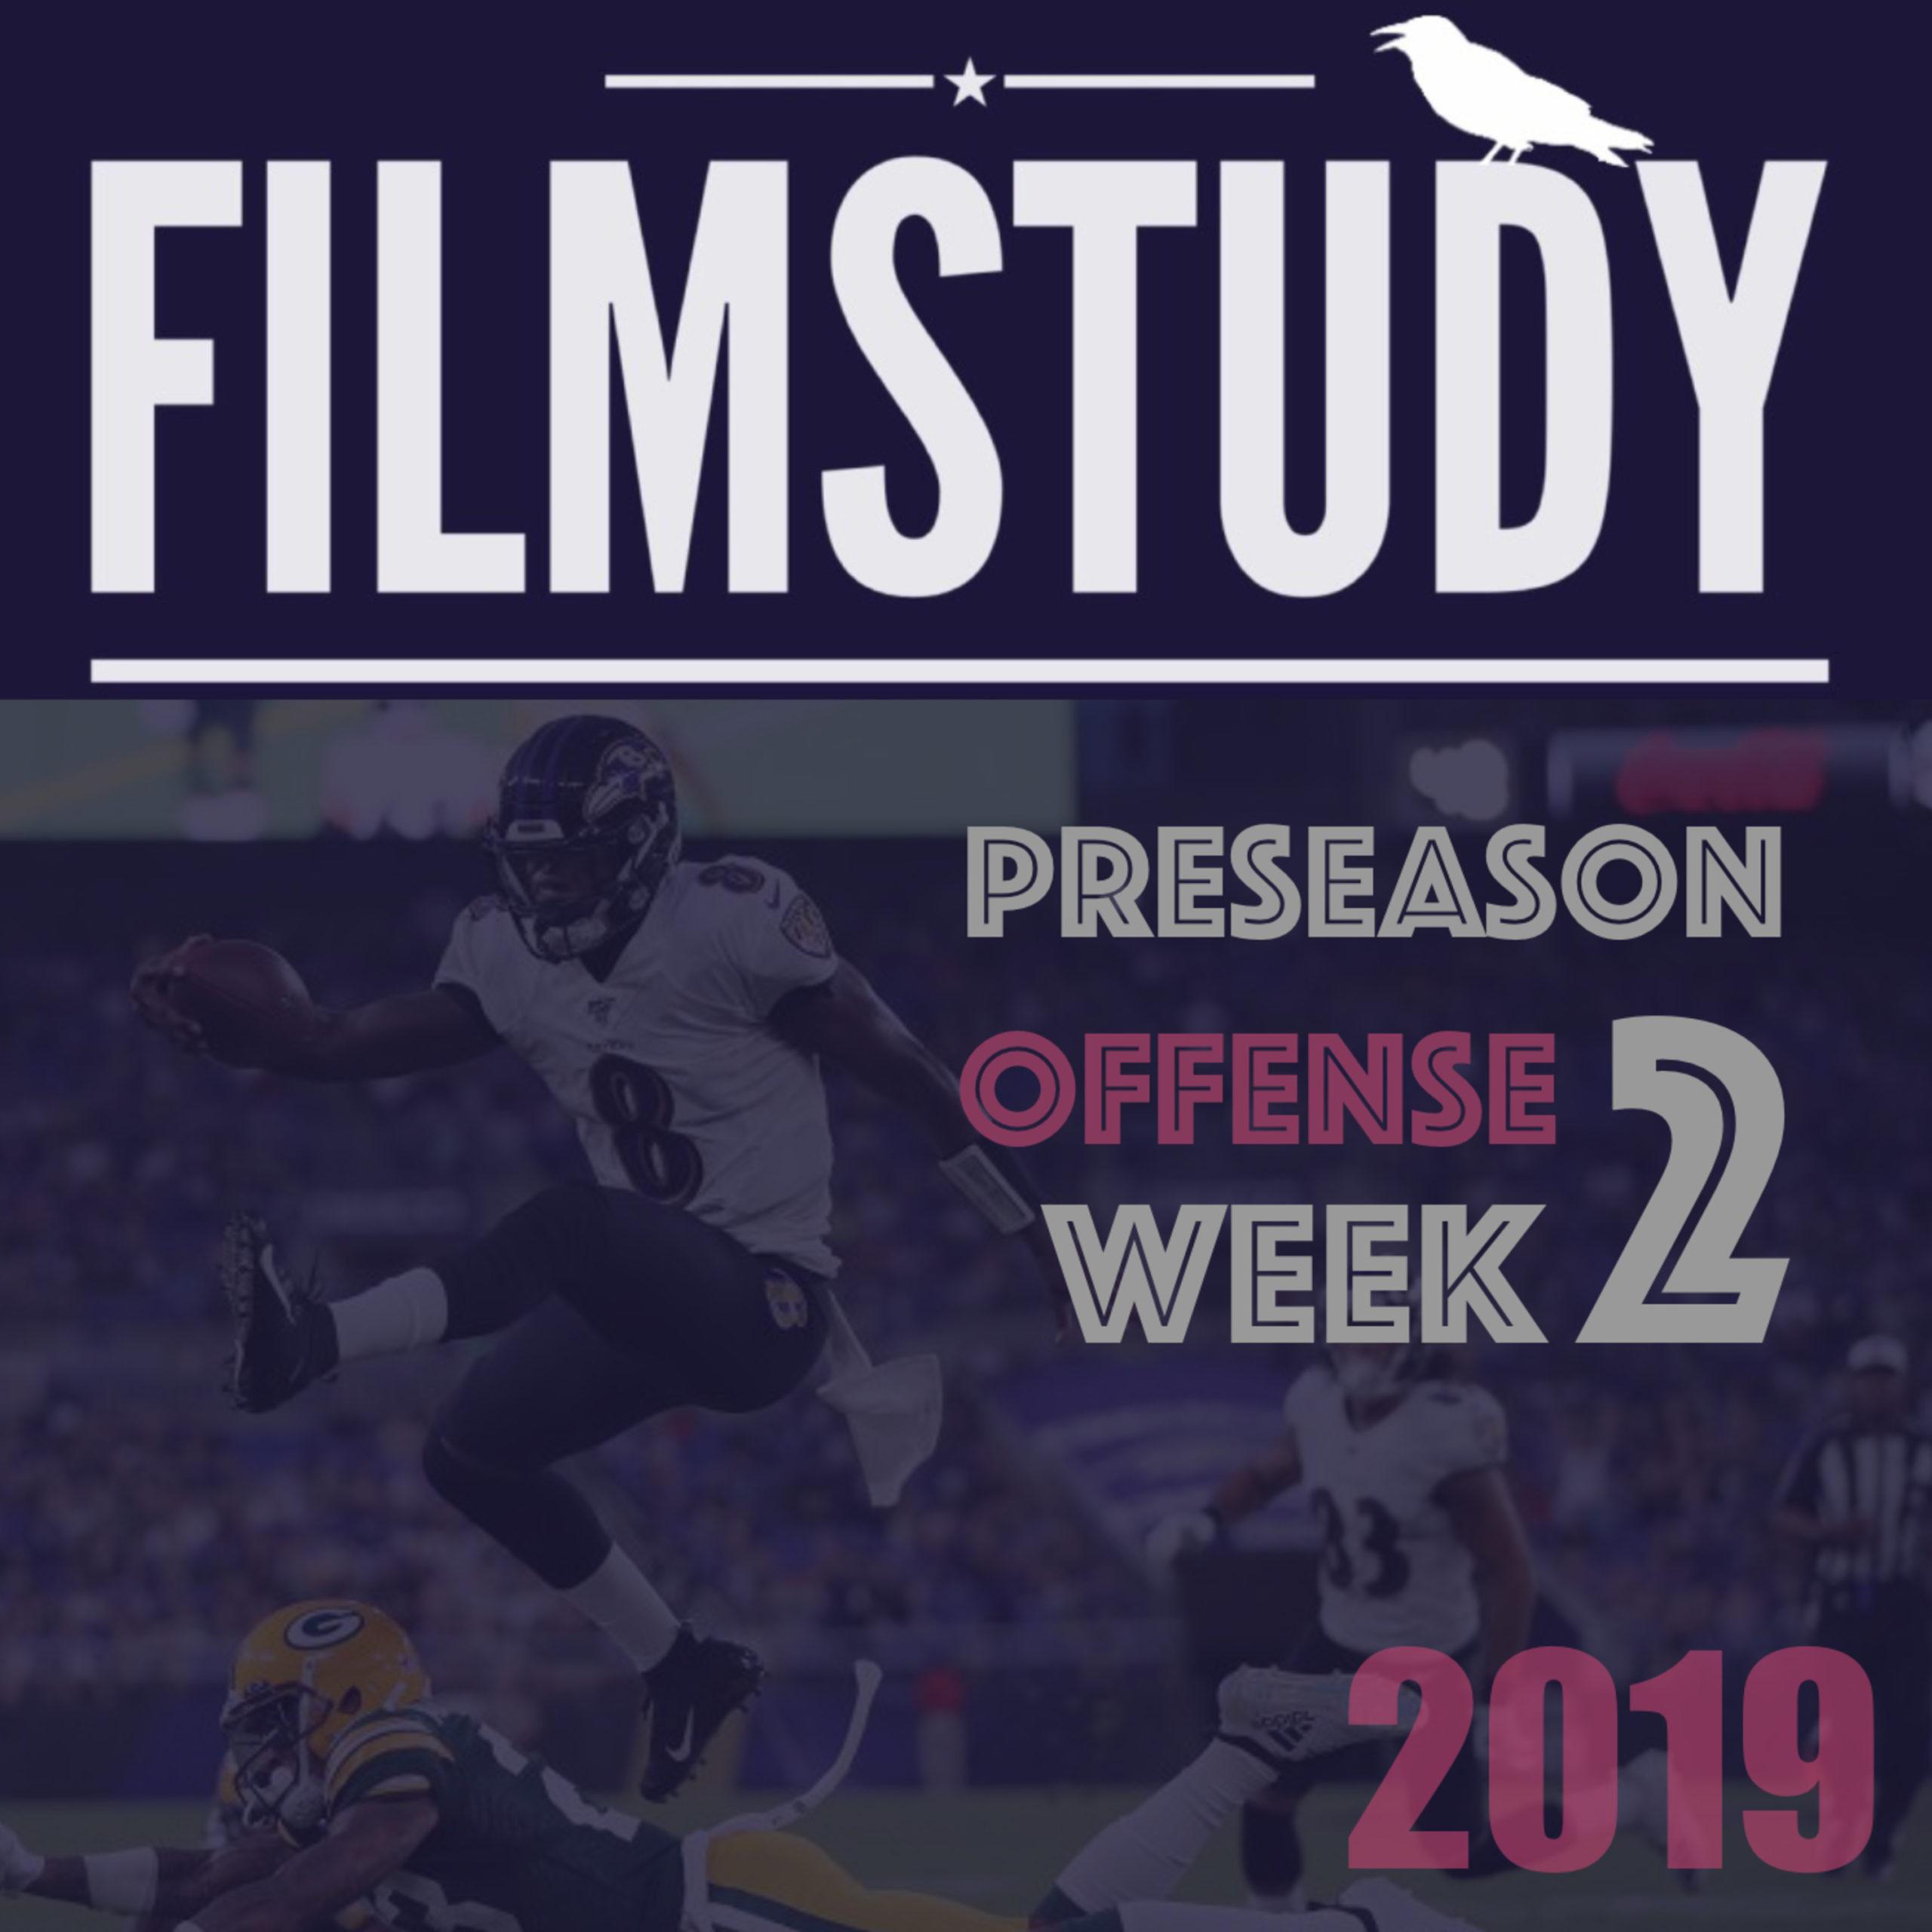 Offense : Preseason Week 2